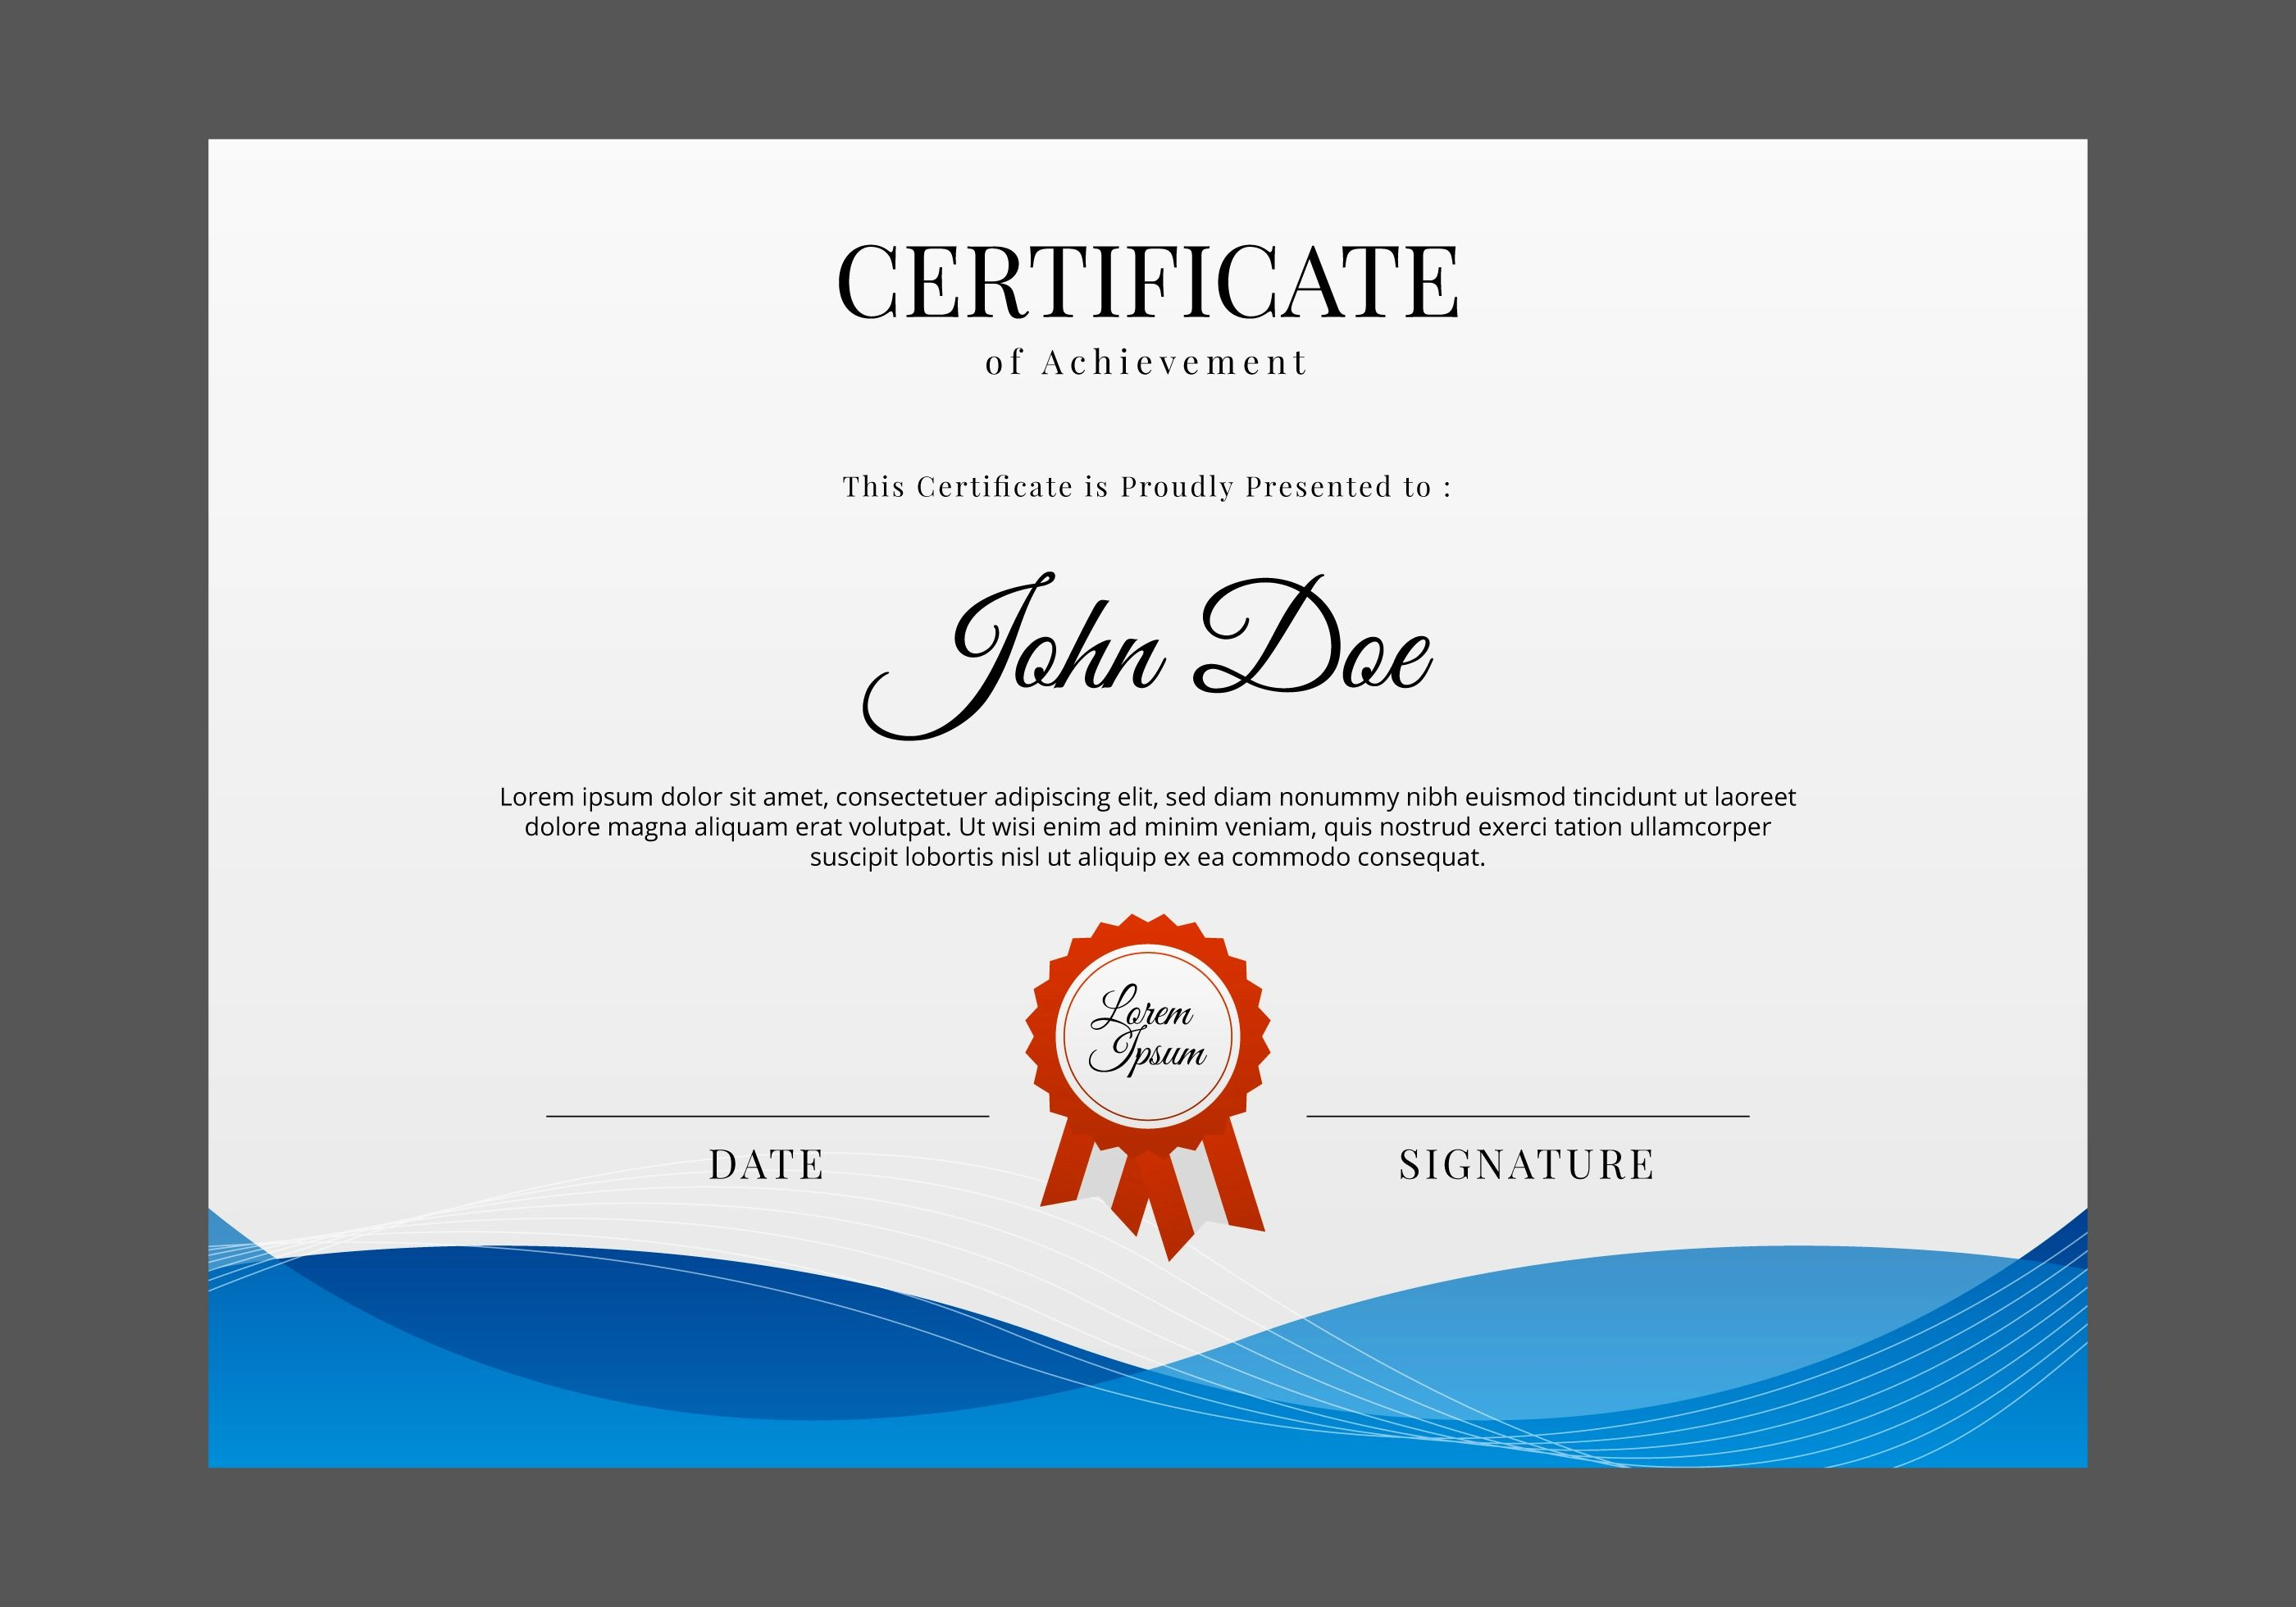 certificat templates